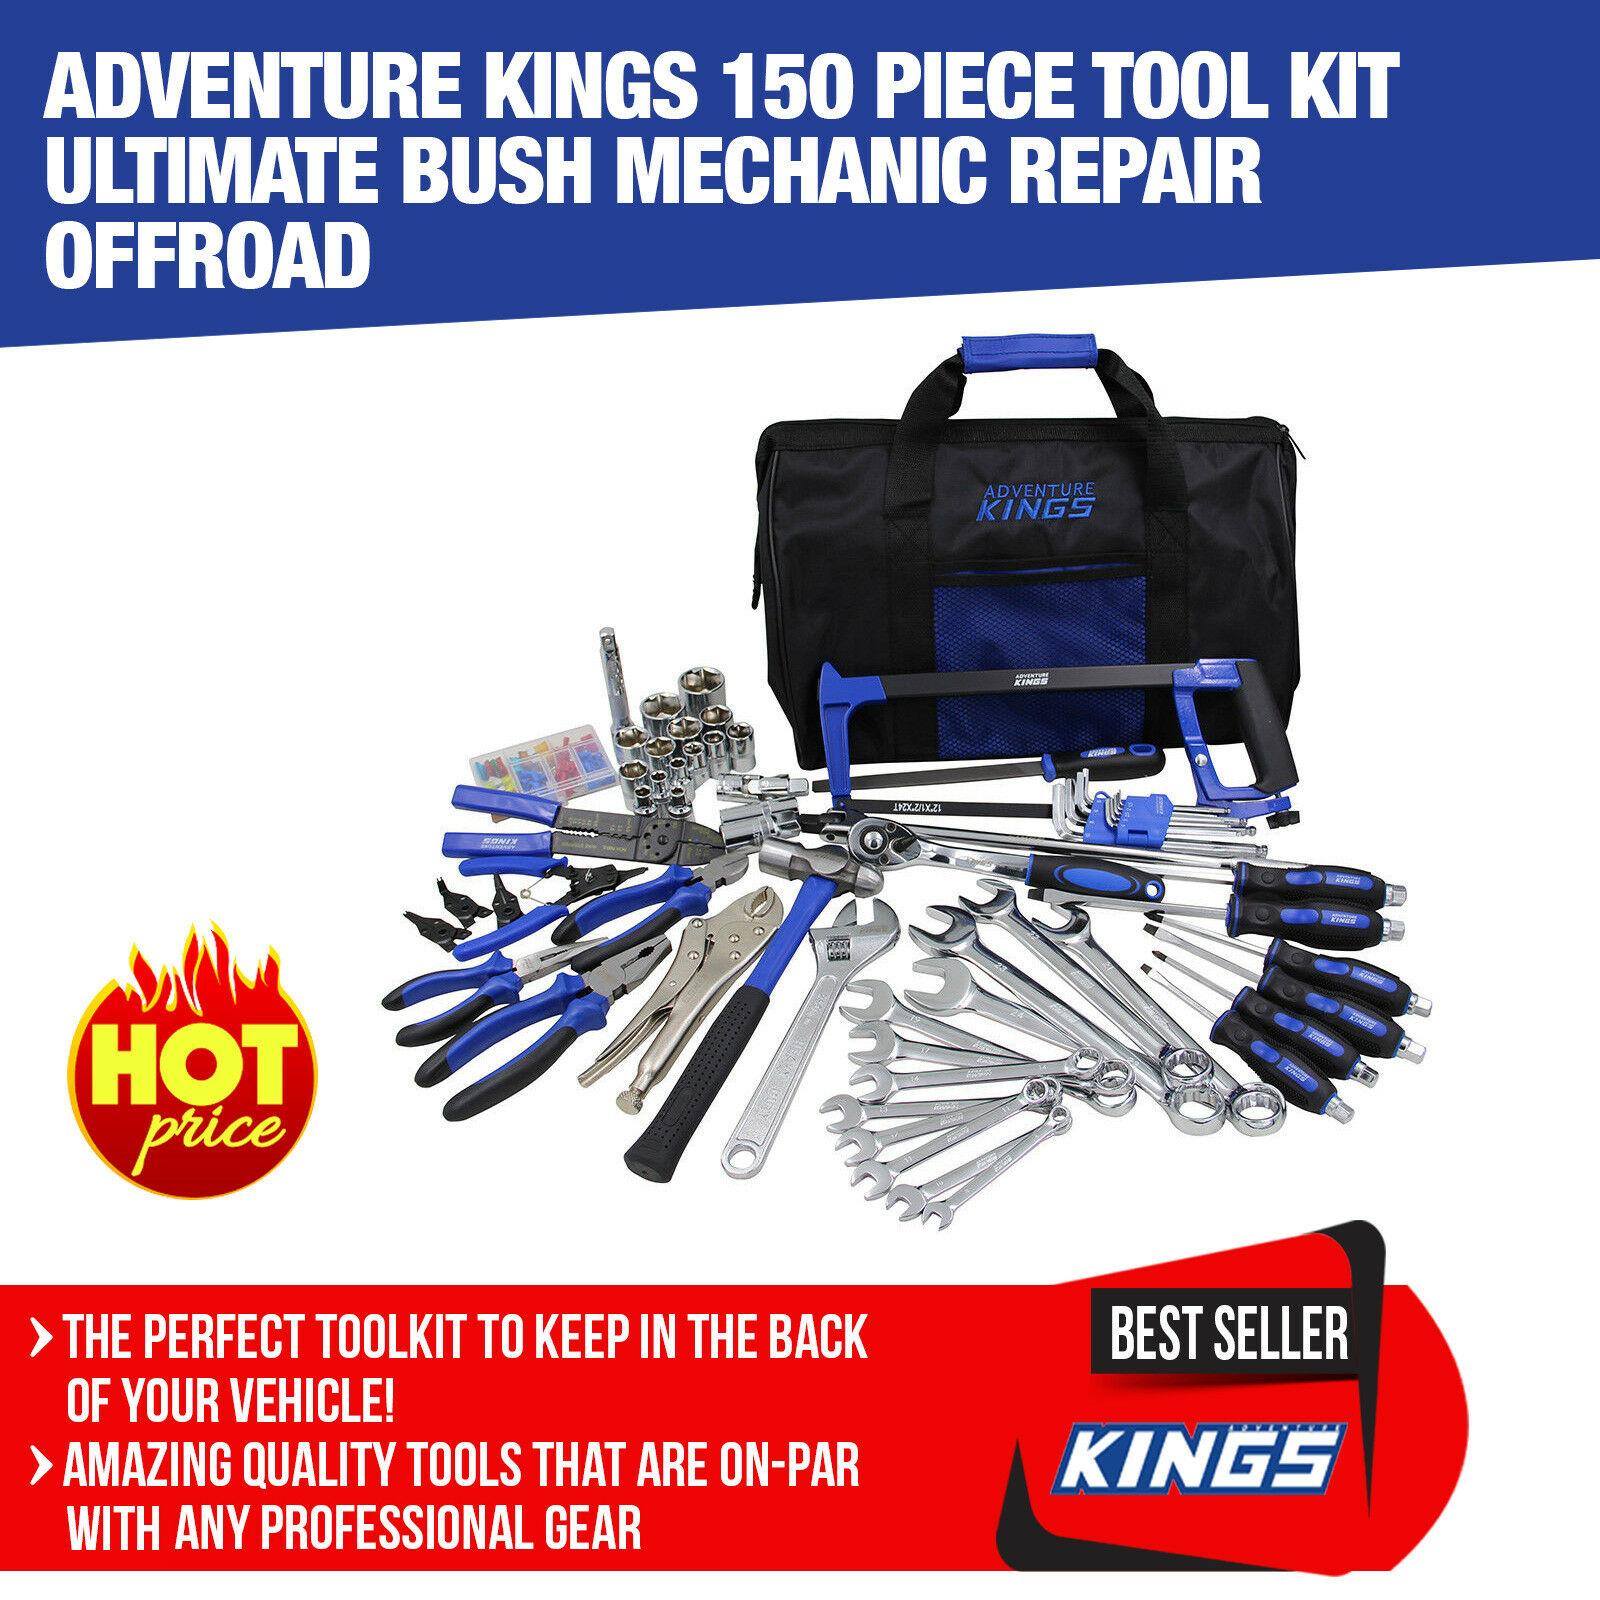 Adventure Kings 150 Piece Tool Kit Ultimate Bush Mechanic Repair Offroad